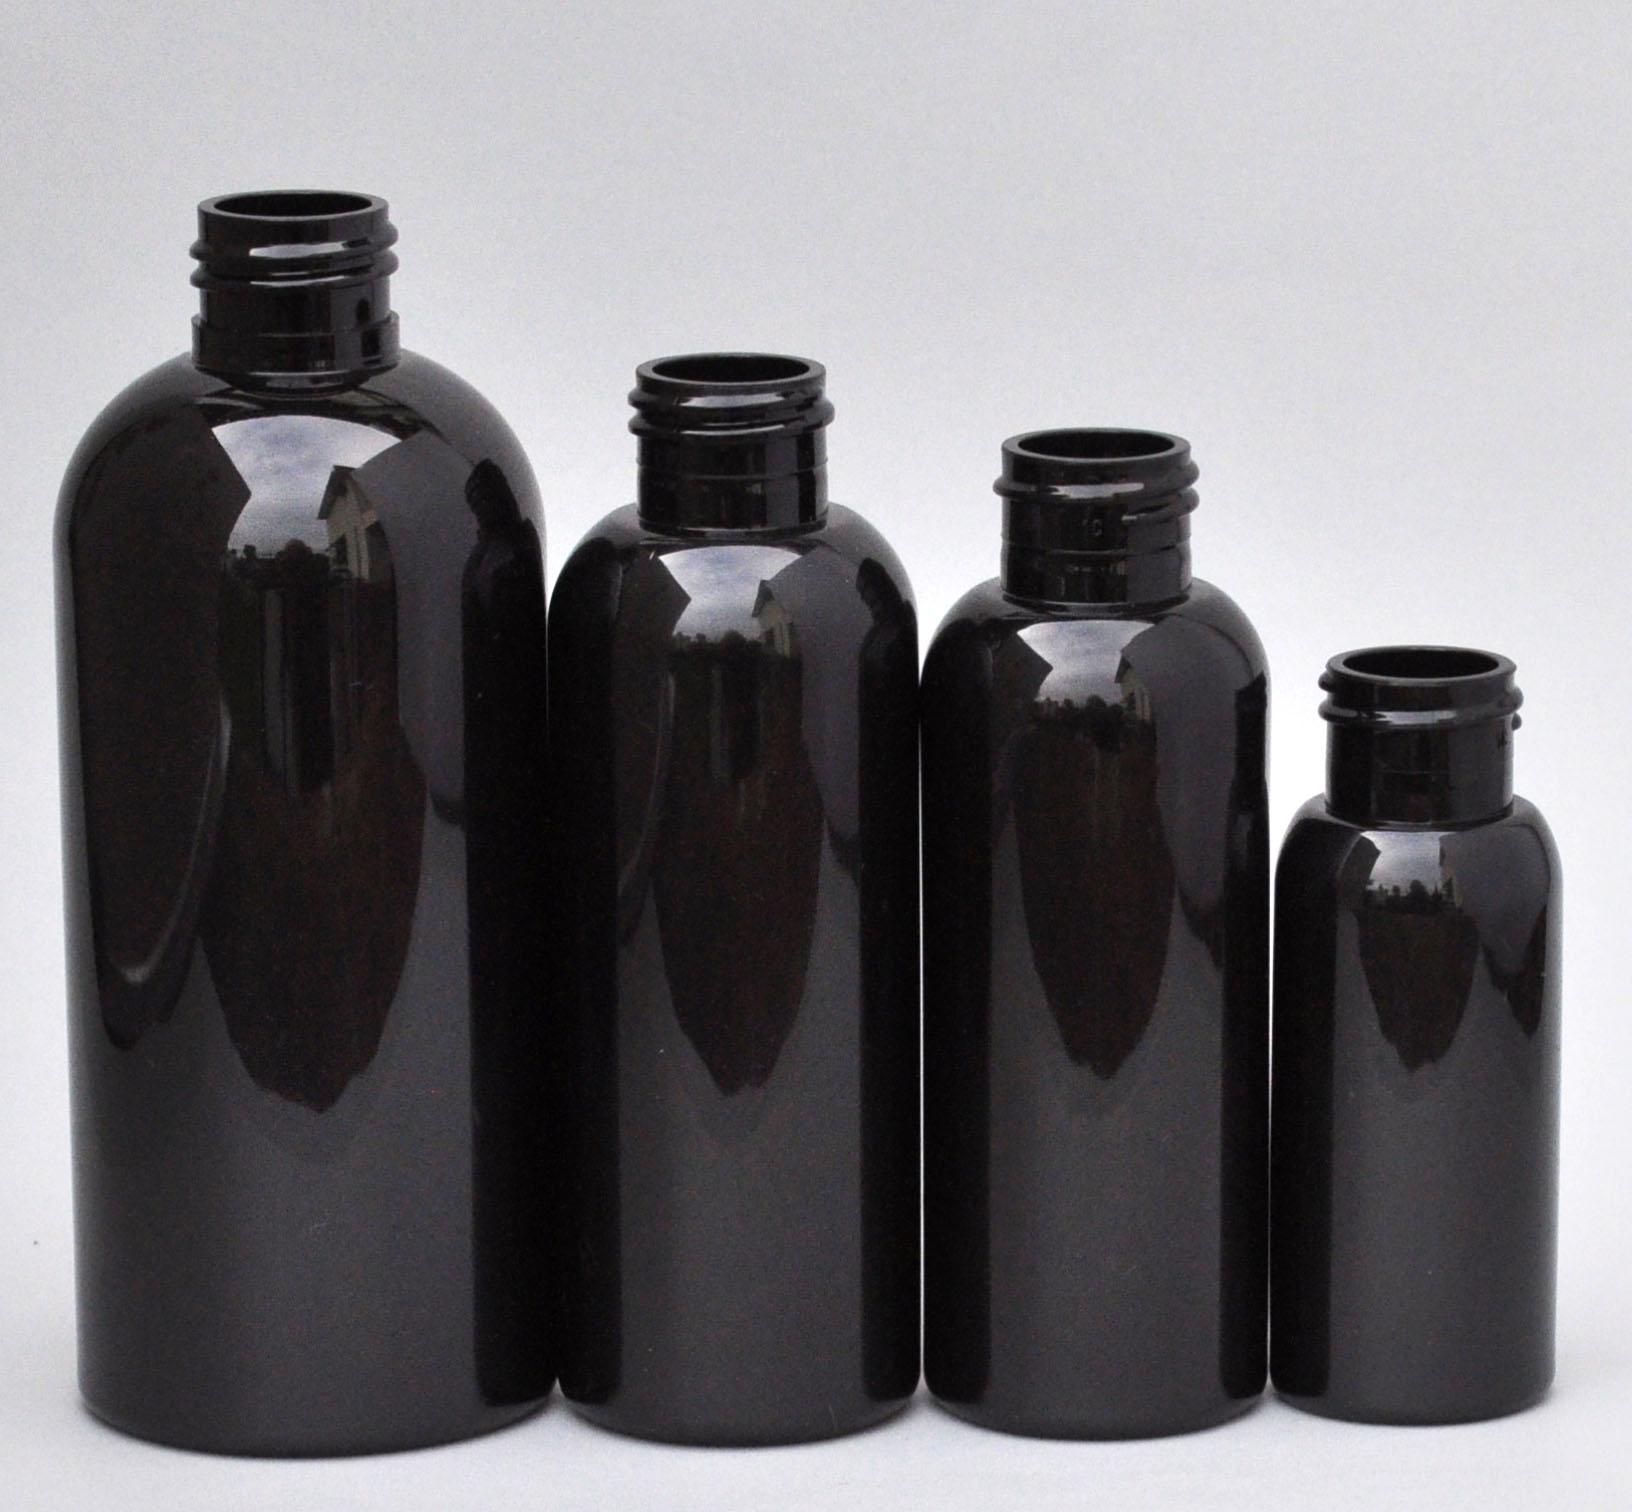 SNEP-250BPETB-250ml Black PET Boston Bottle with 24/410 Neck